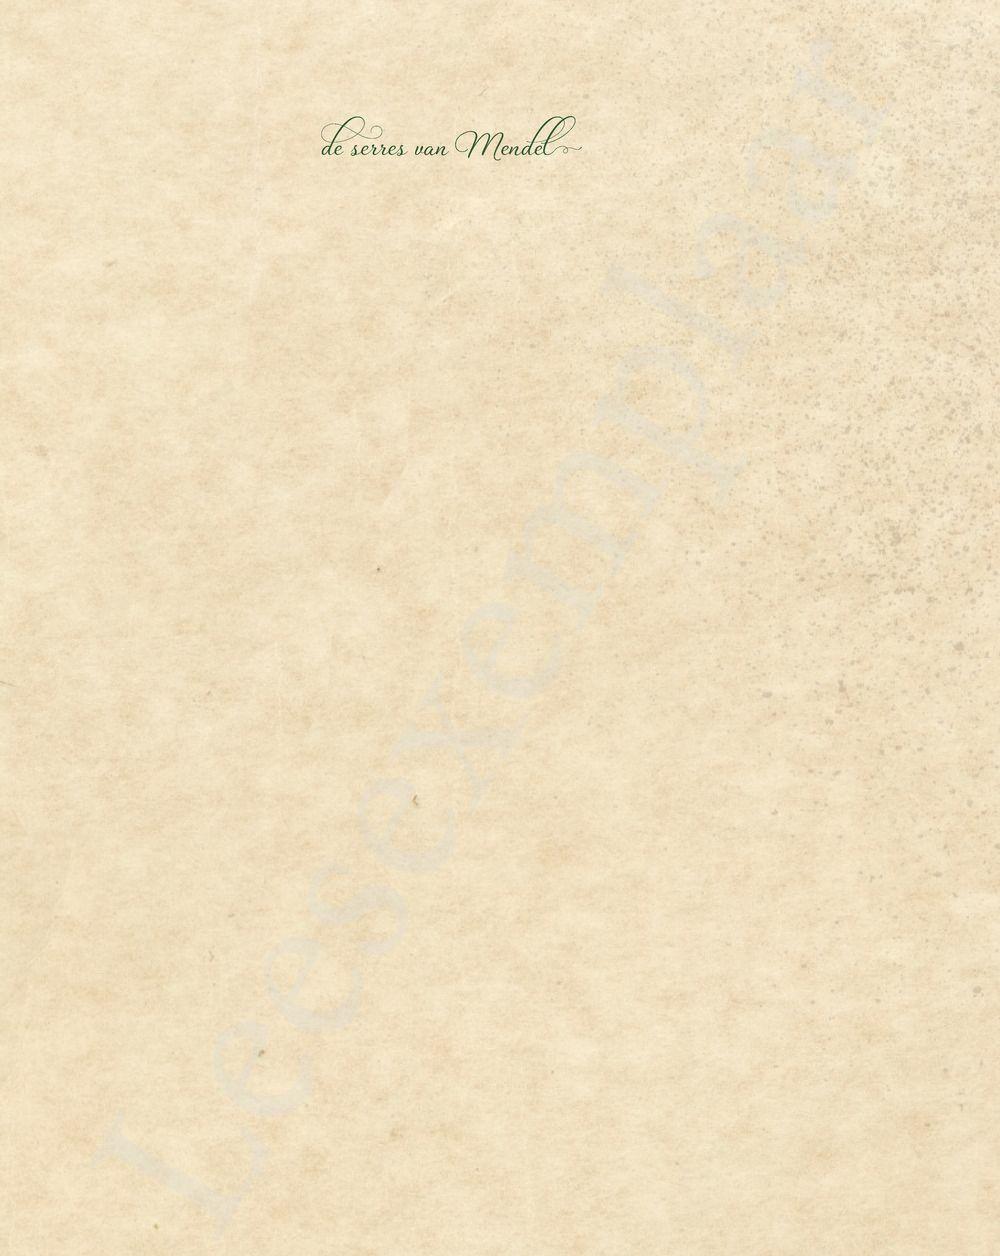 Preview: De serres van Mendel